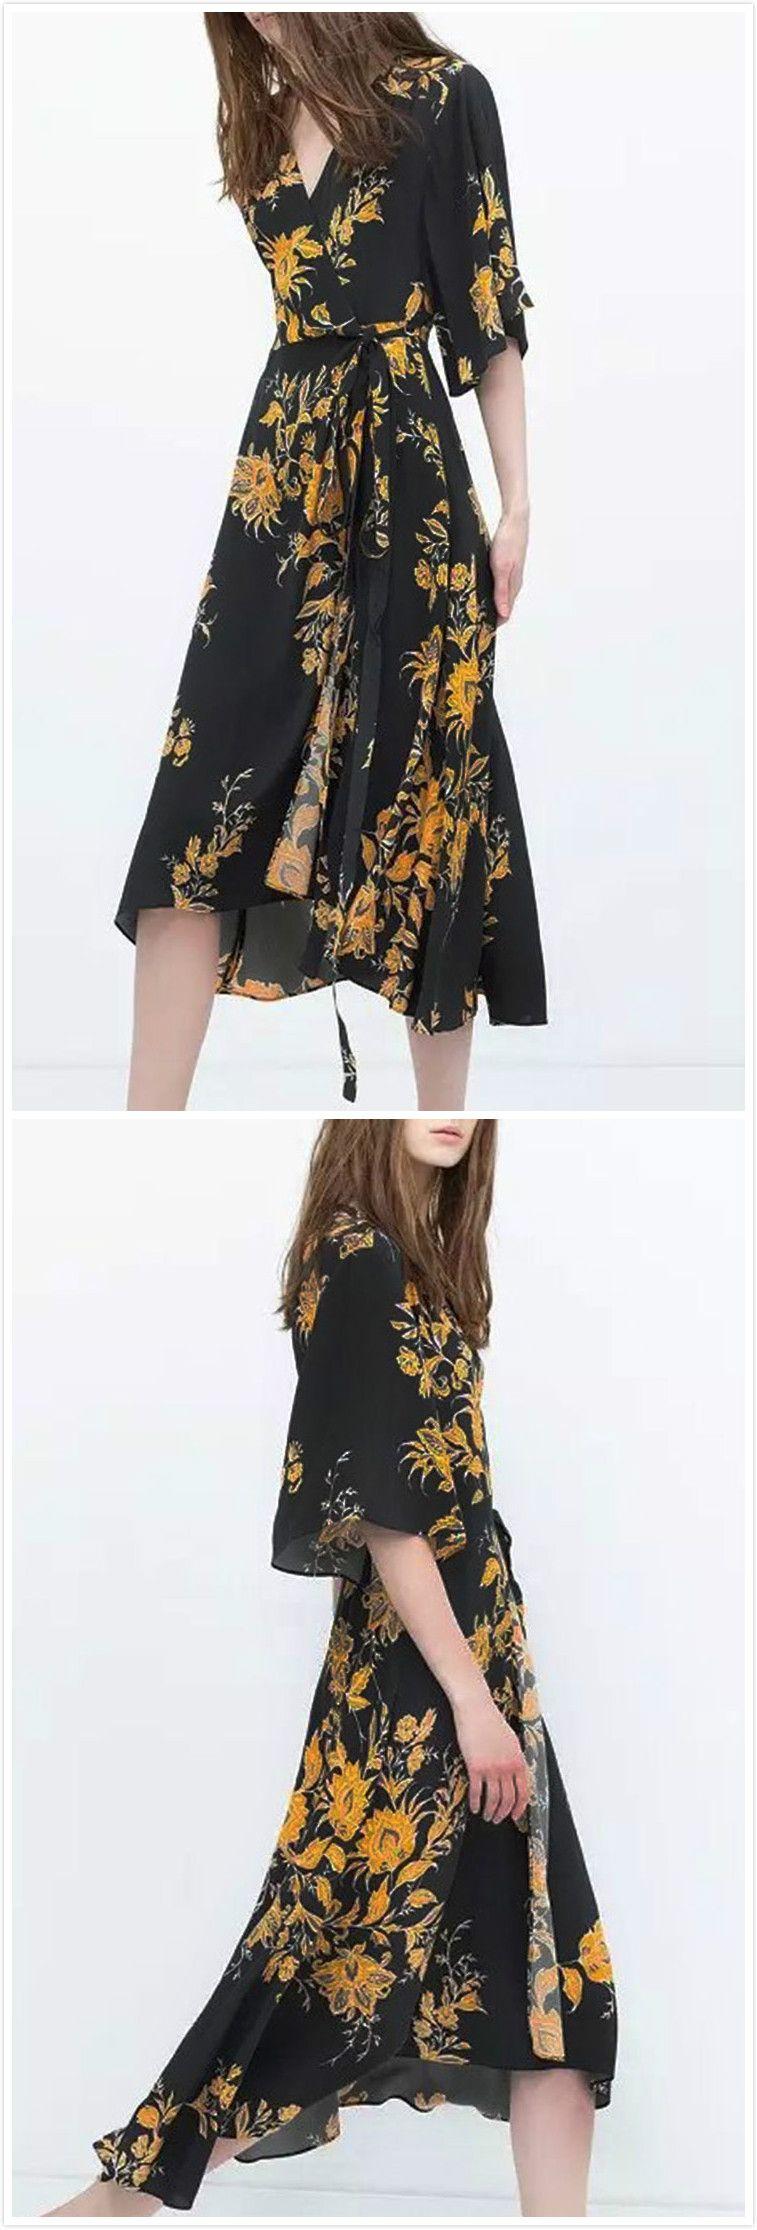 8a012c72d9713 Wonderful 3/4 Sleeve Surplice Front Style Surplice Midi Dress ...